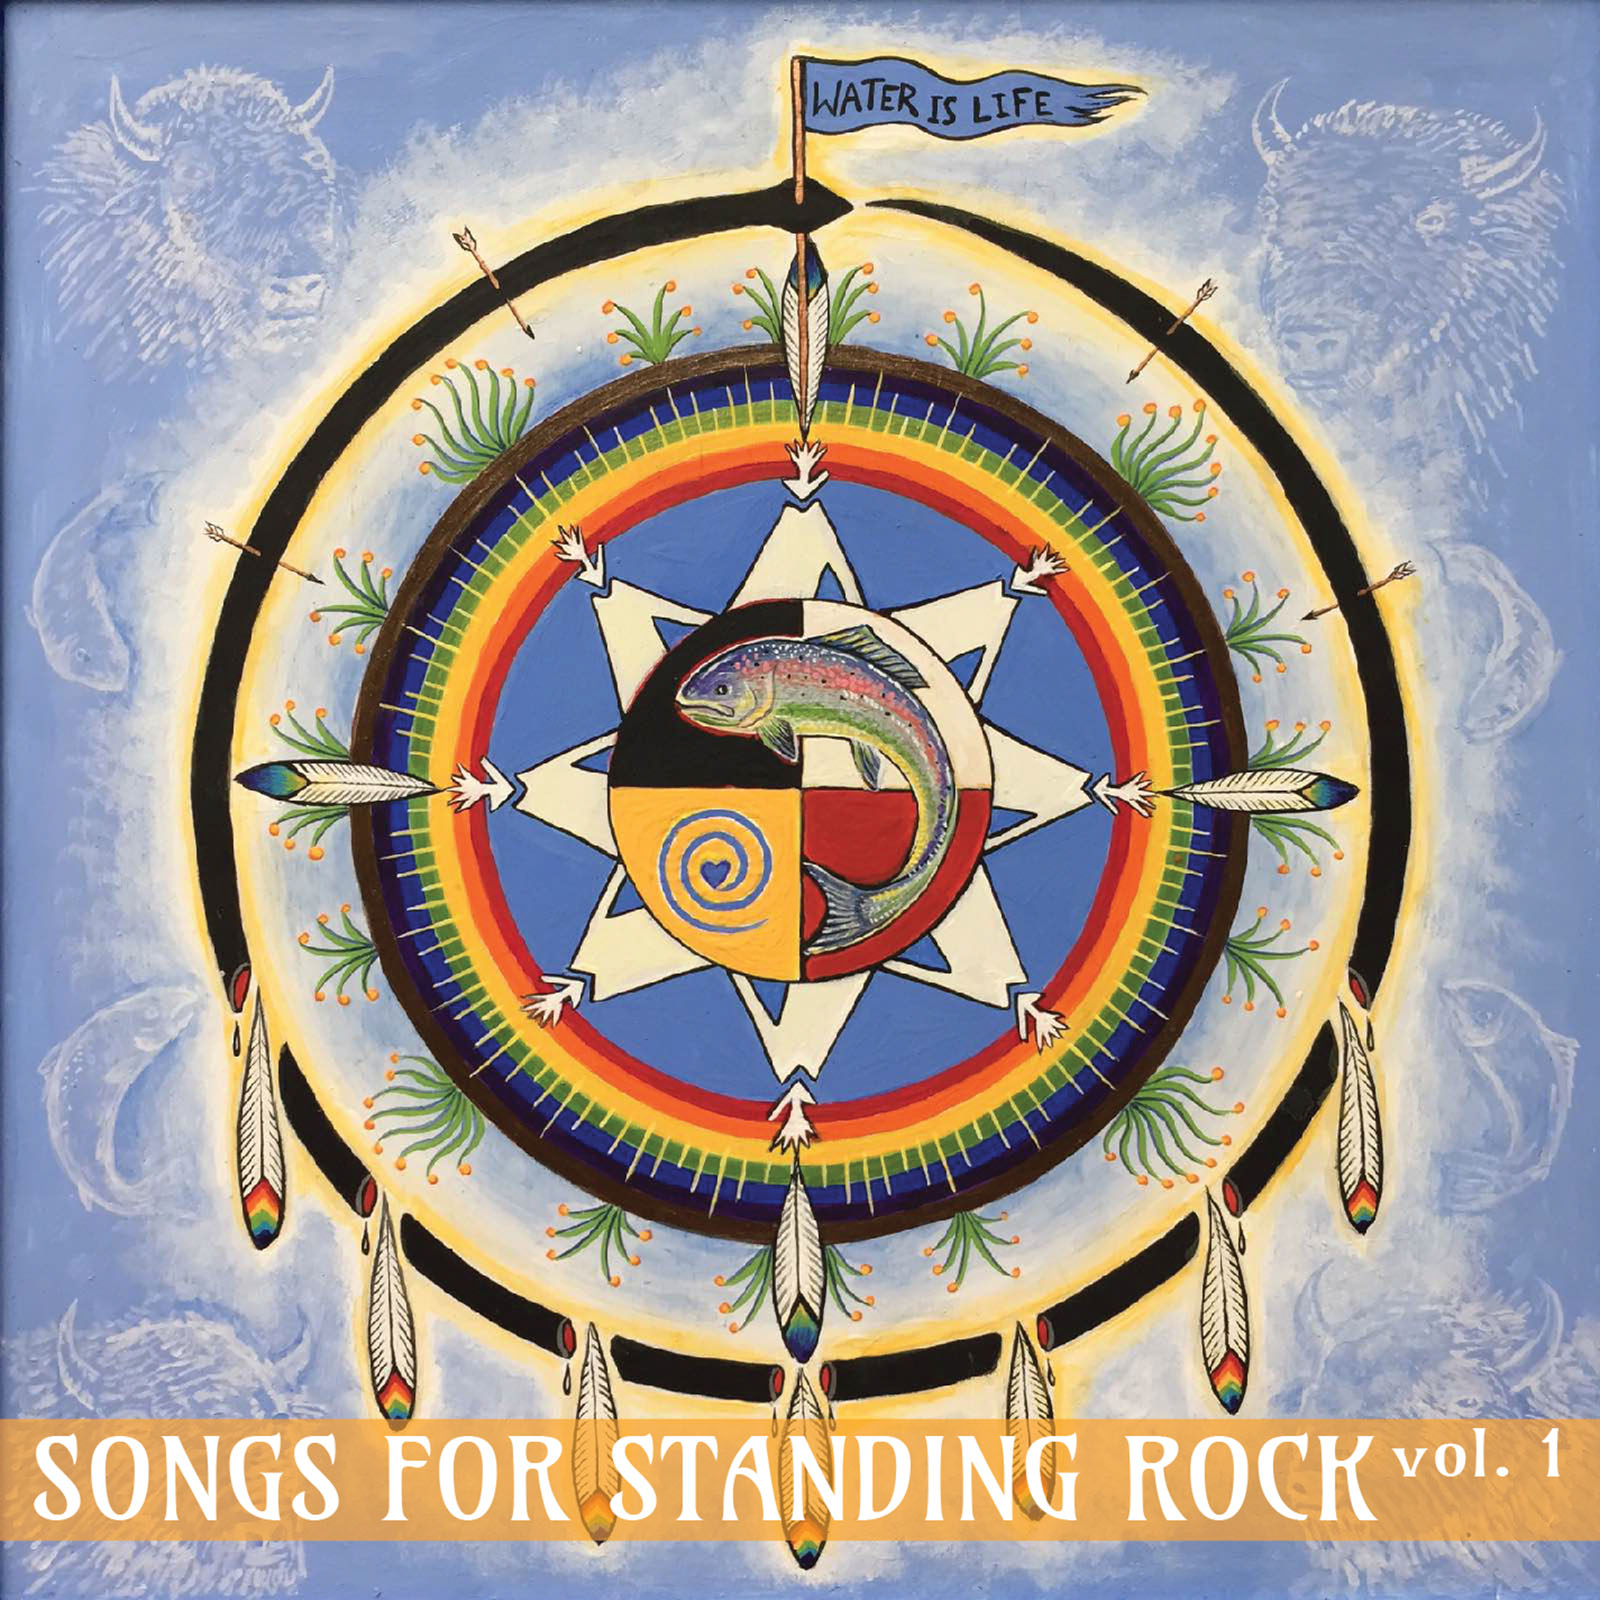 Songs for Standing Rock Vol. 1_cover-01.jpg